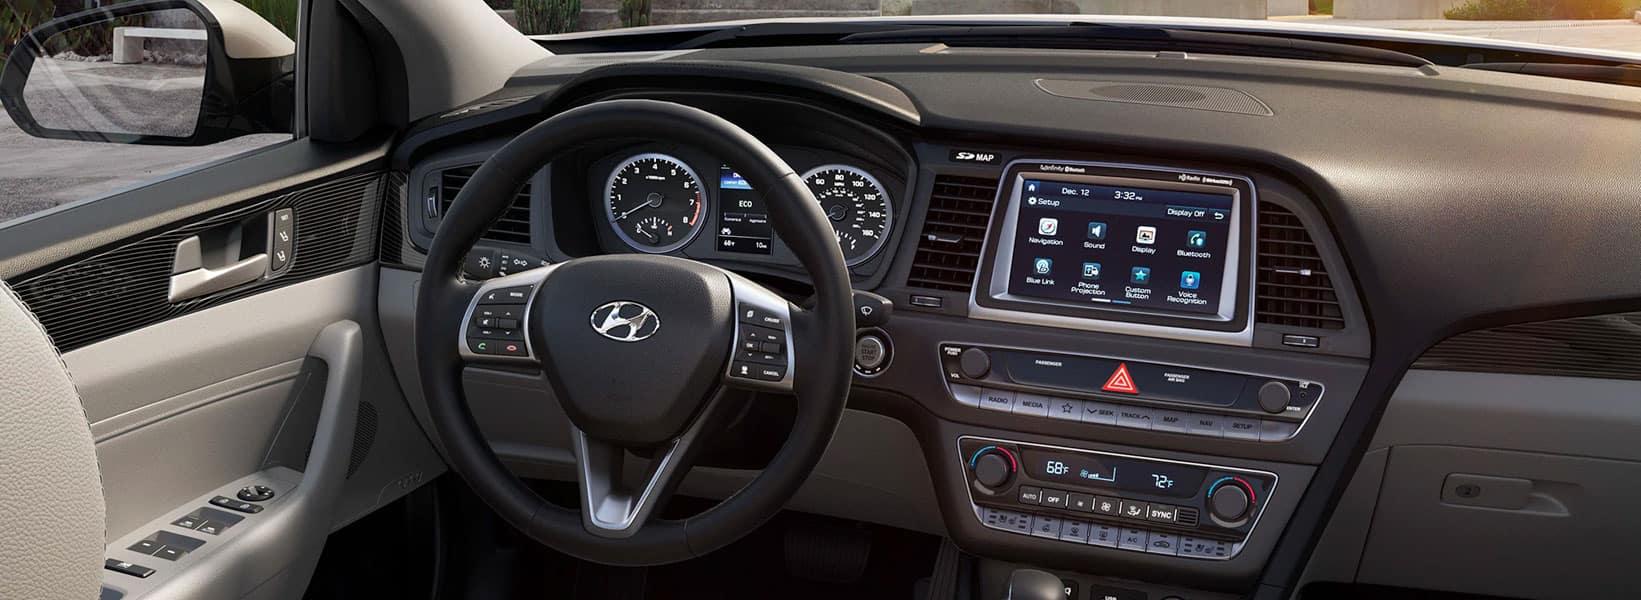 2019 Hyundai Sonata Features Chicago IL